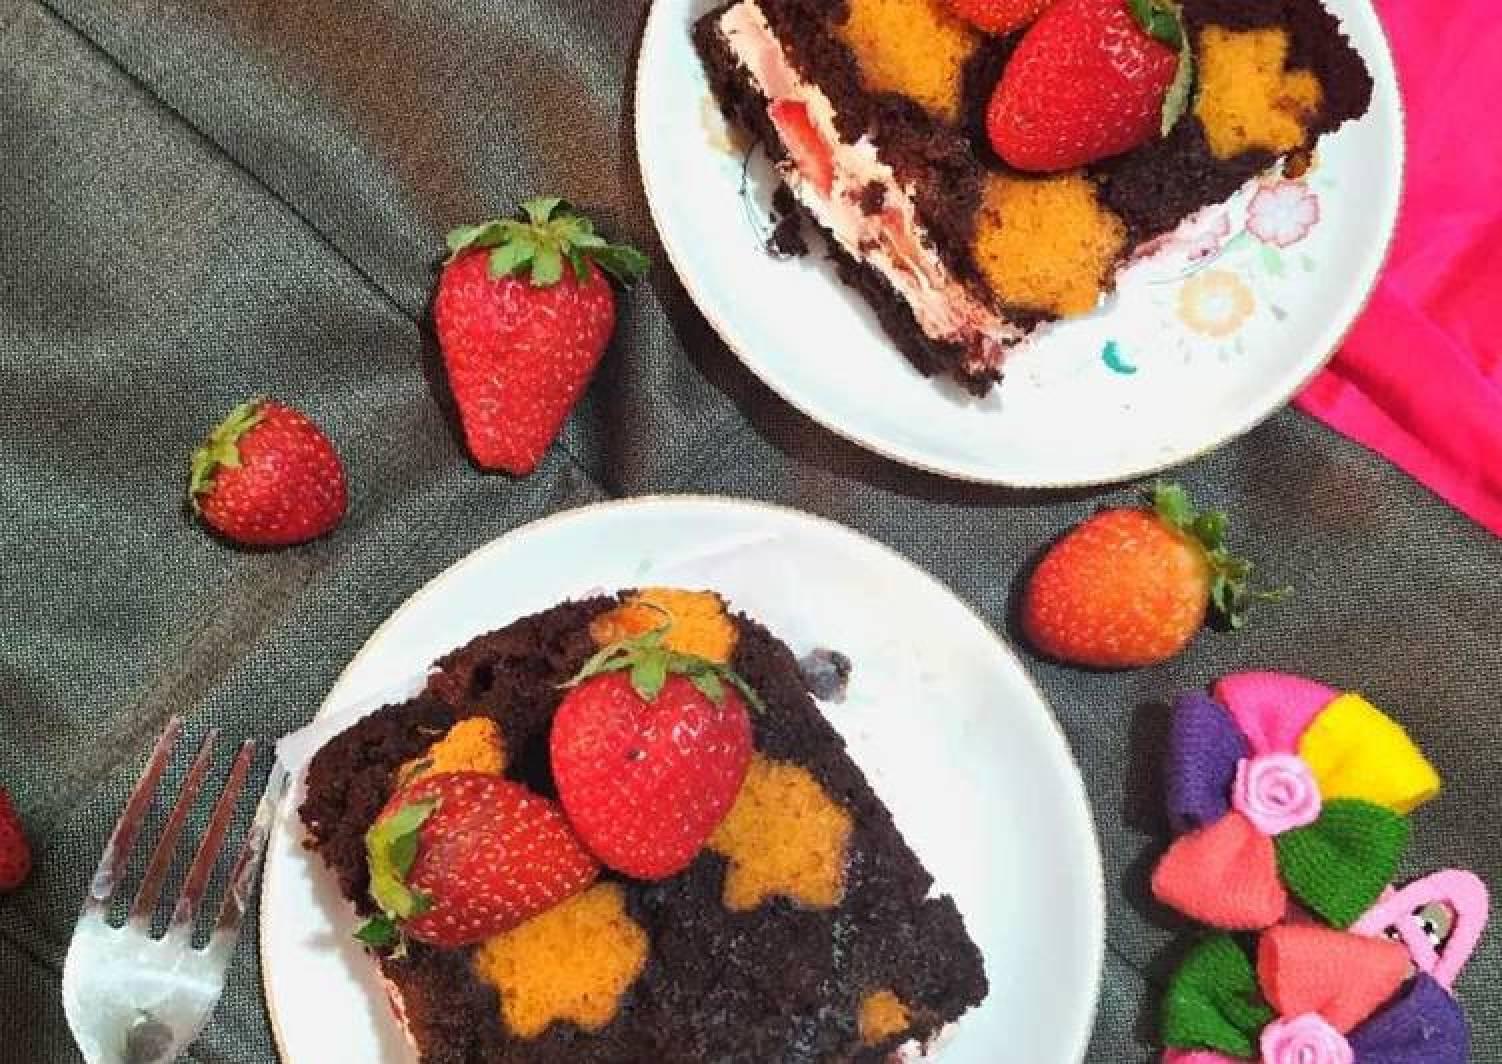 Star print strawberry chocolate sandwich cake